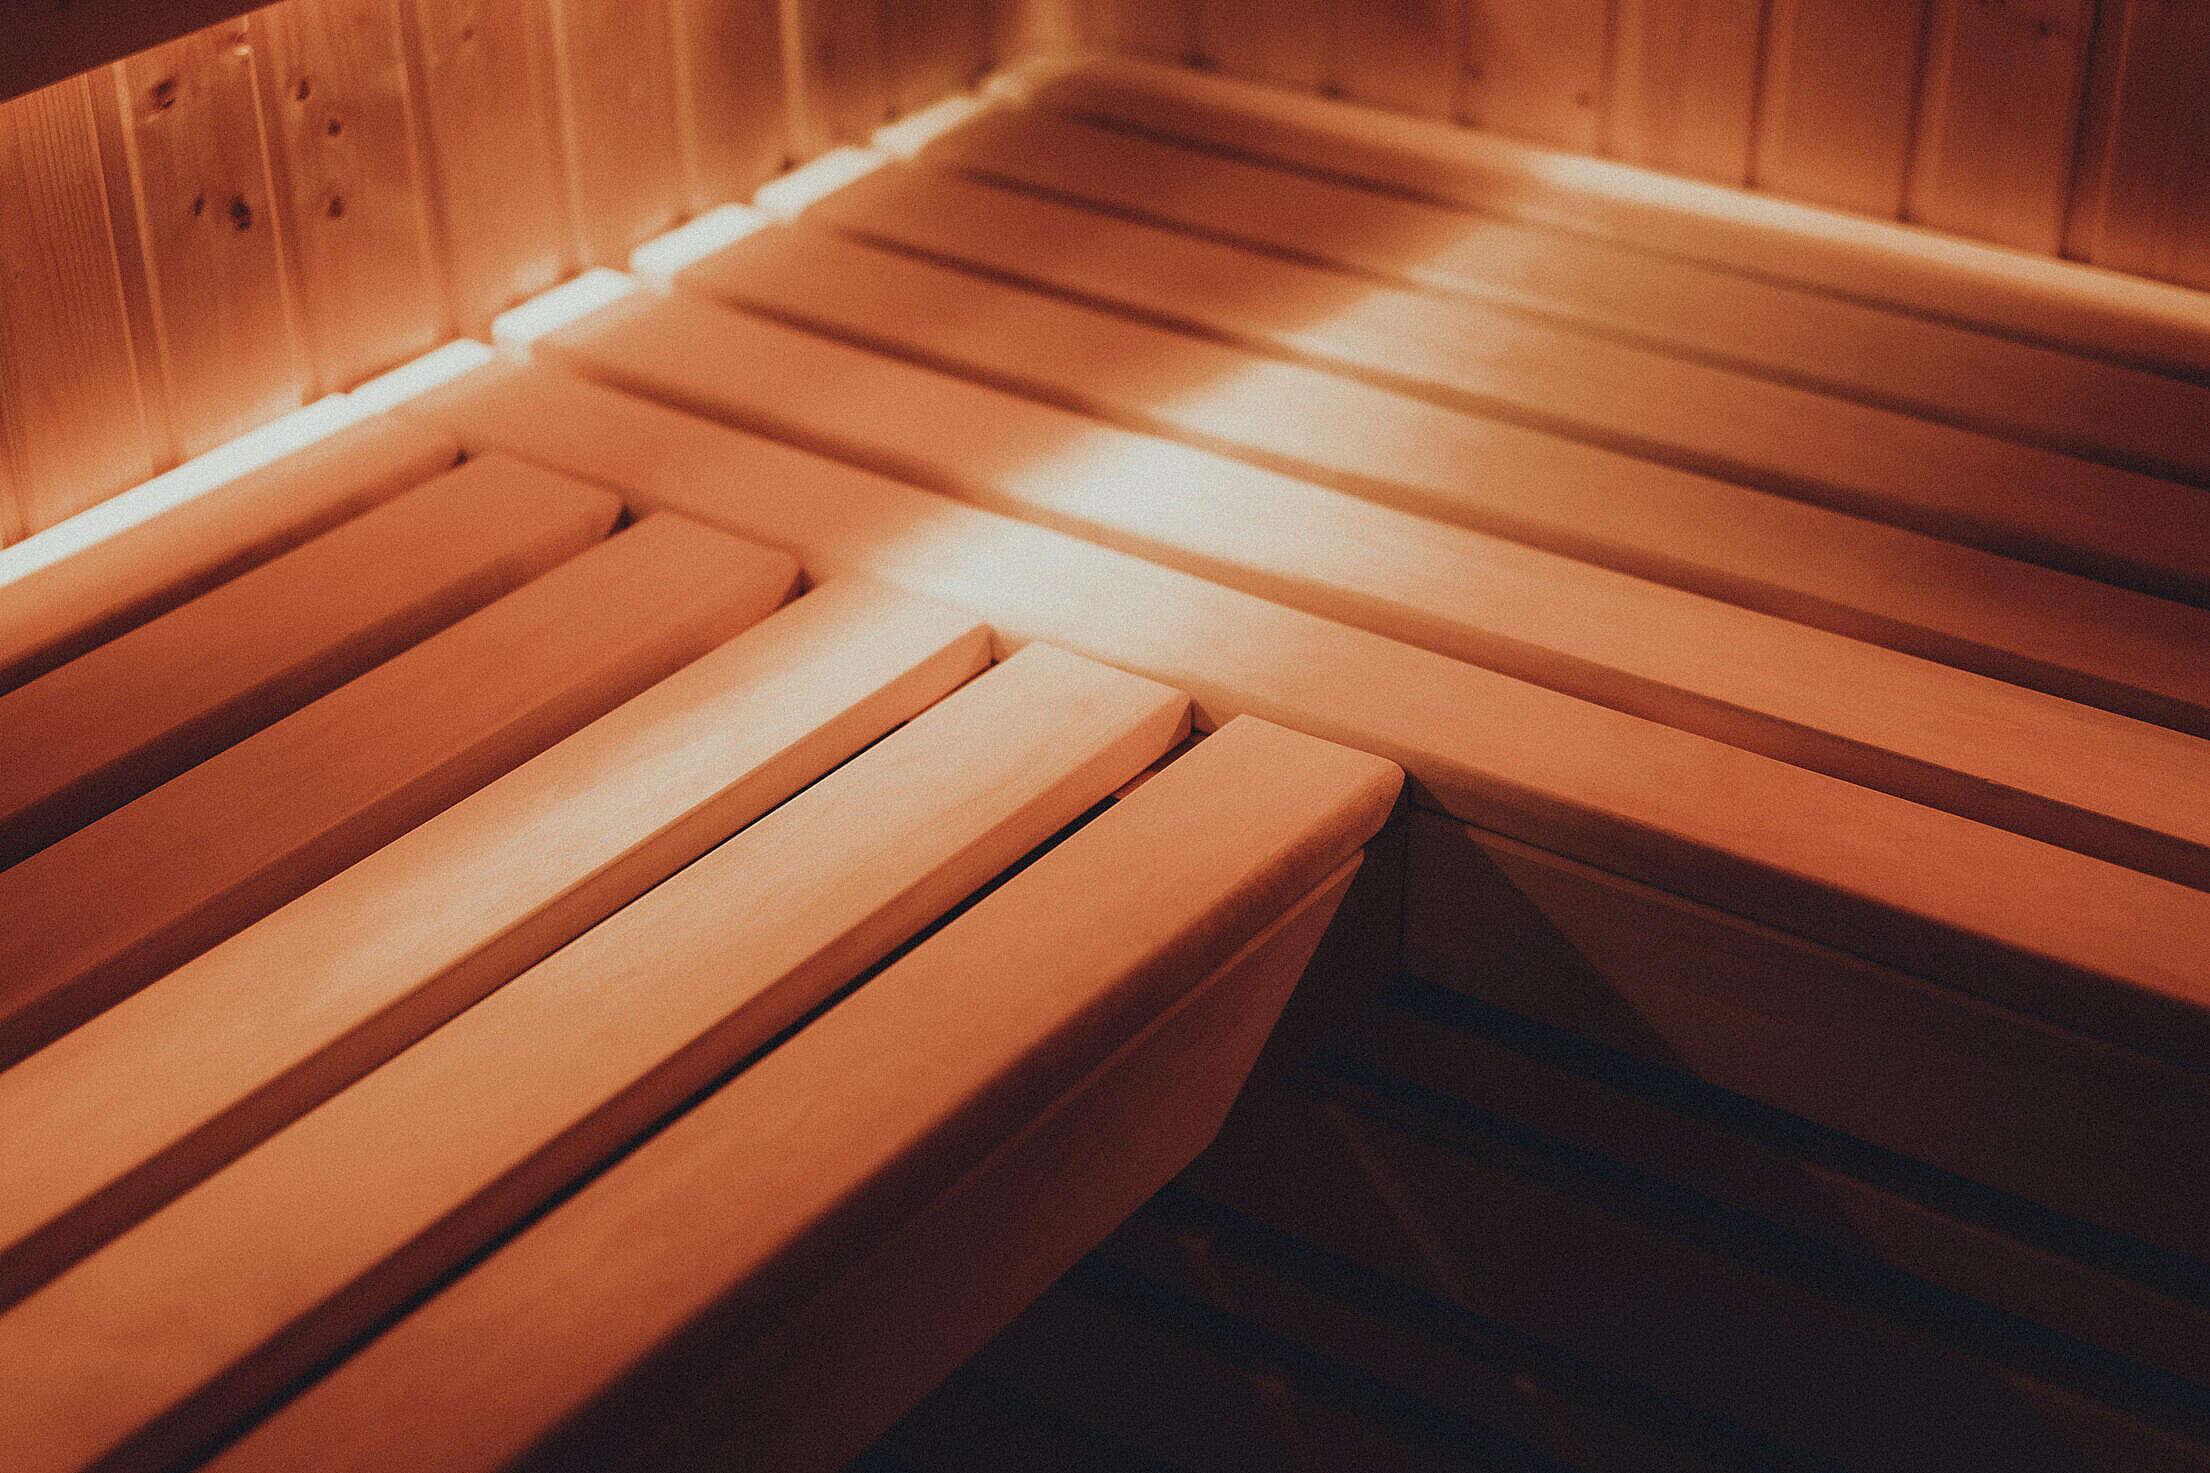 Wooden Bench in Finnish Sauna Free Stock Photo